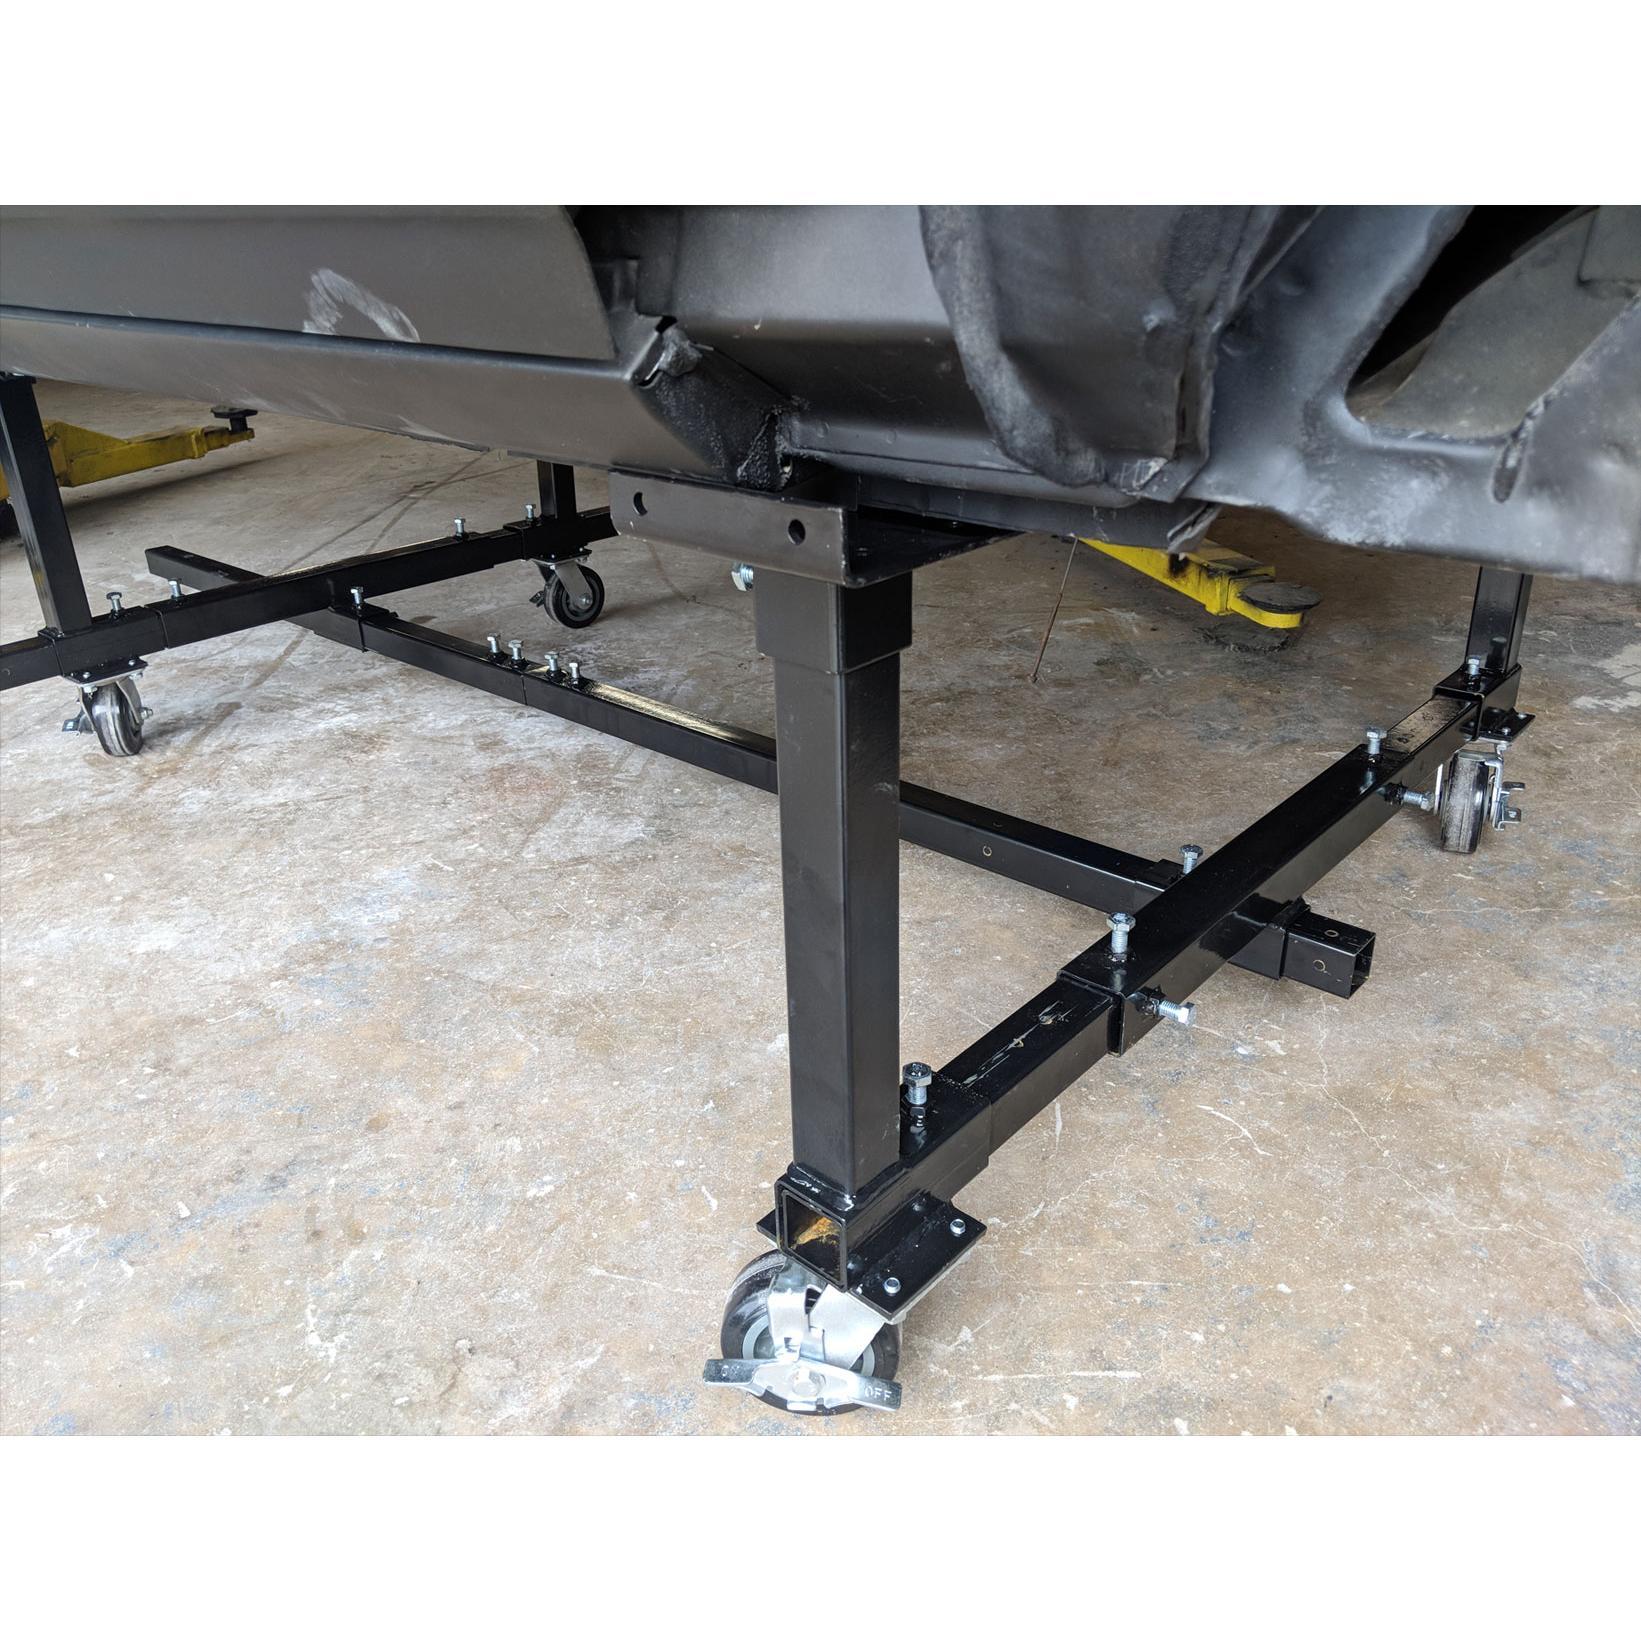 Auto Twirler Mobile Mopar Car Body Restoration Dolly Cart Stand